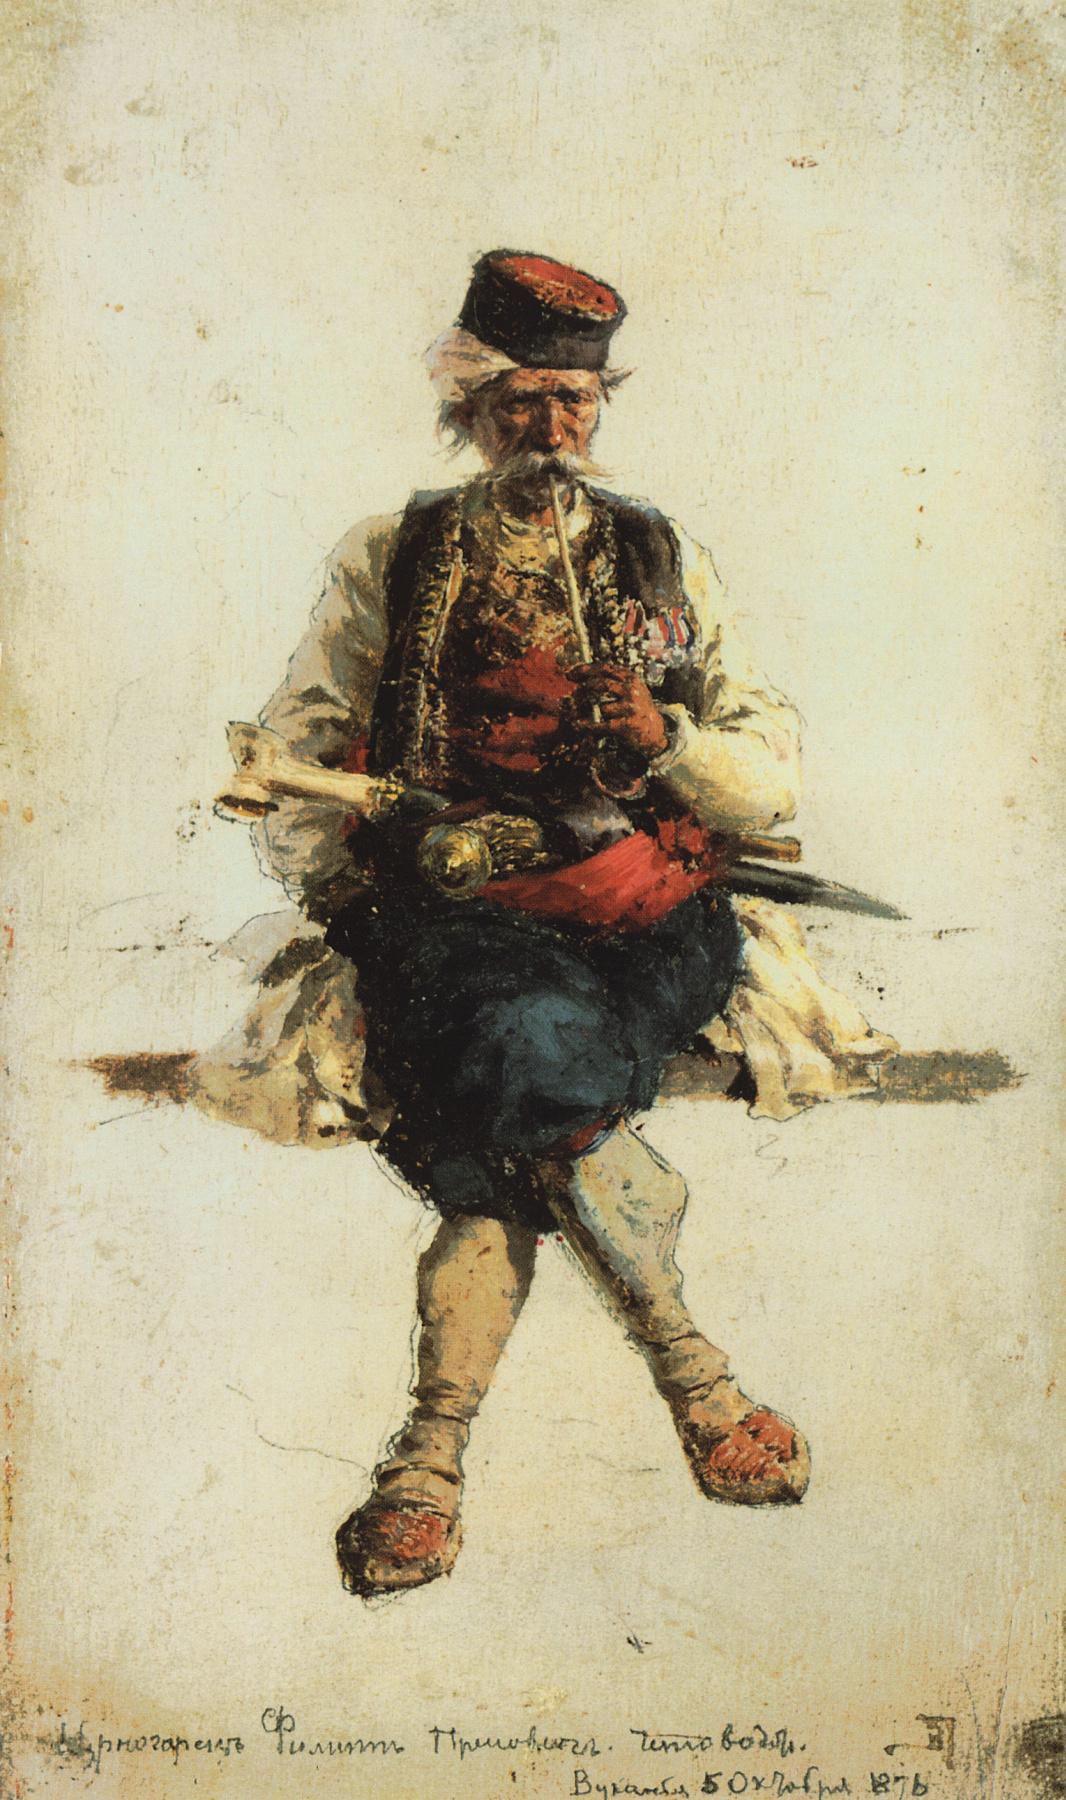 Vasily Dmitrievich Polenov. The Montenegrin. Etude